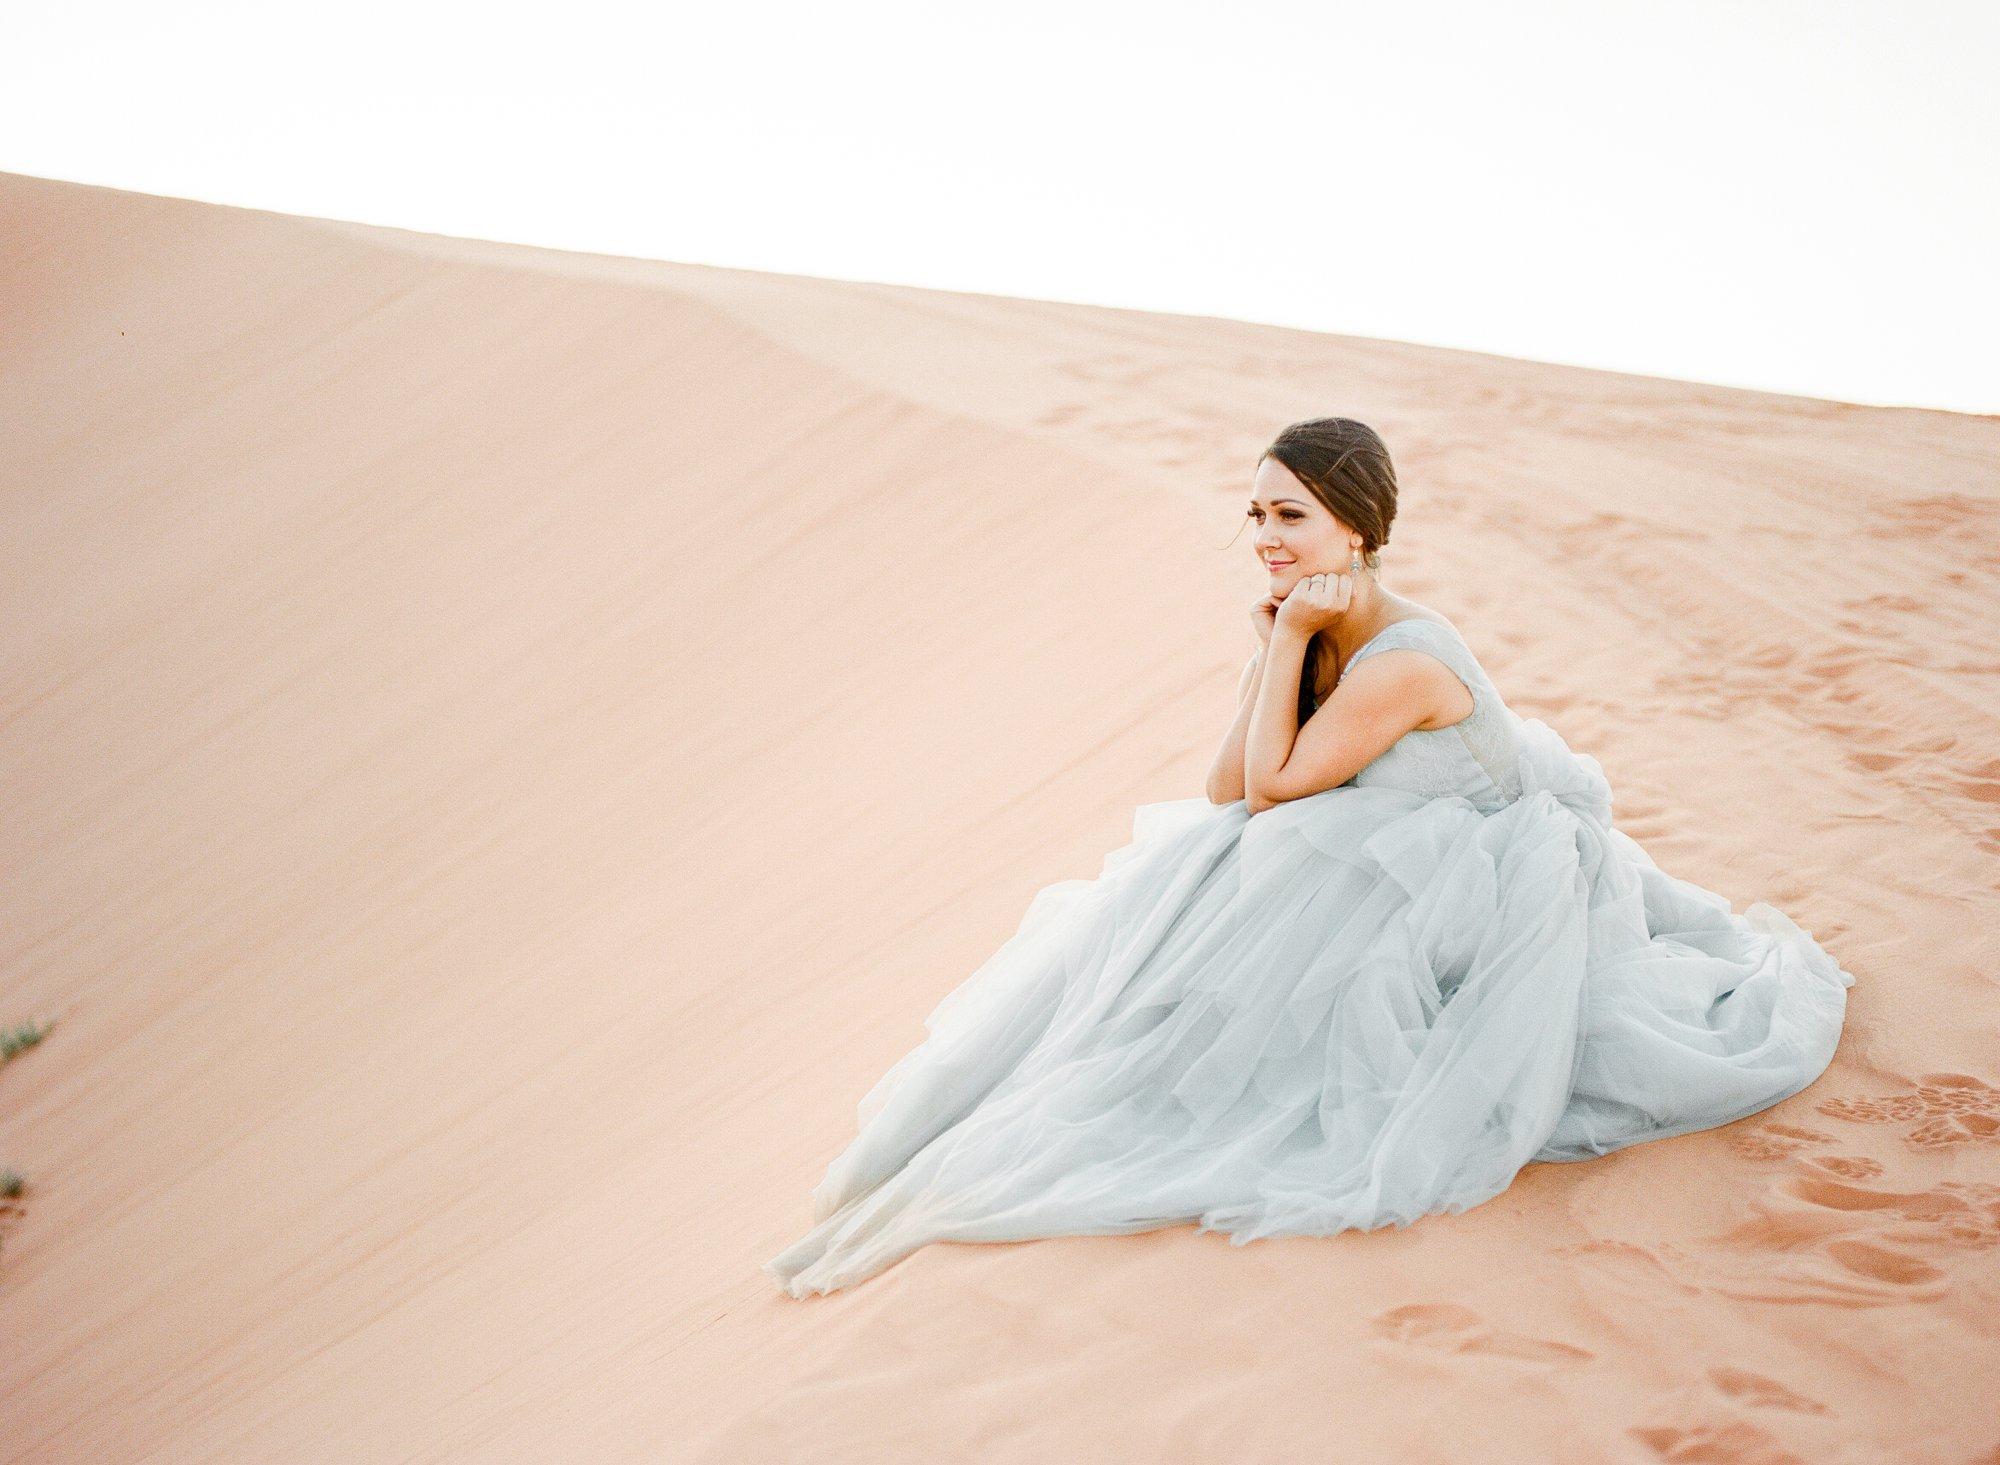 JostlynStilsonPhotography_0817.jpg